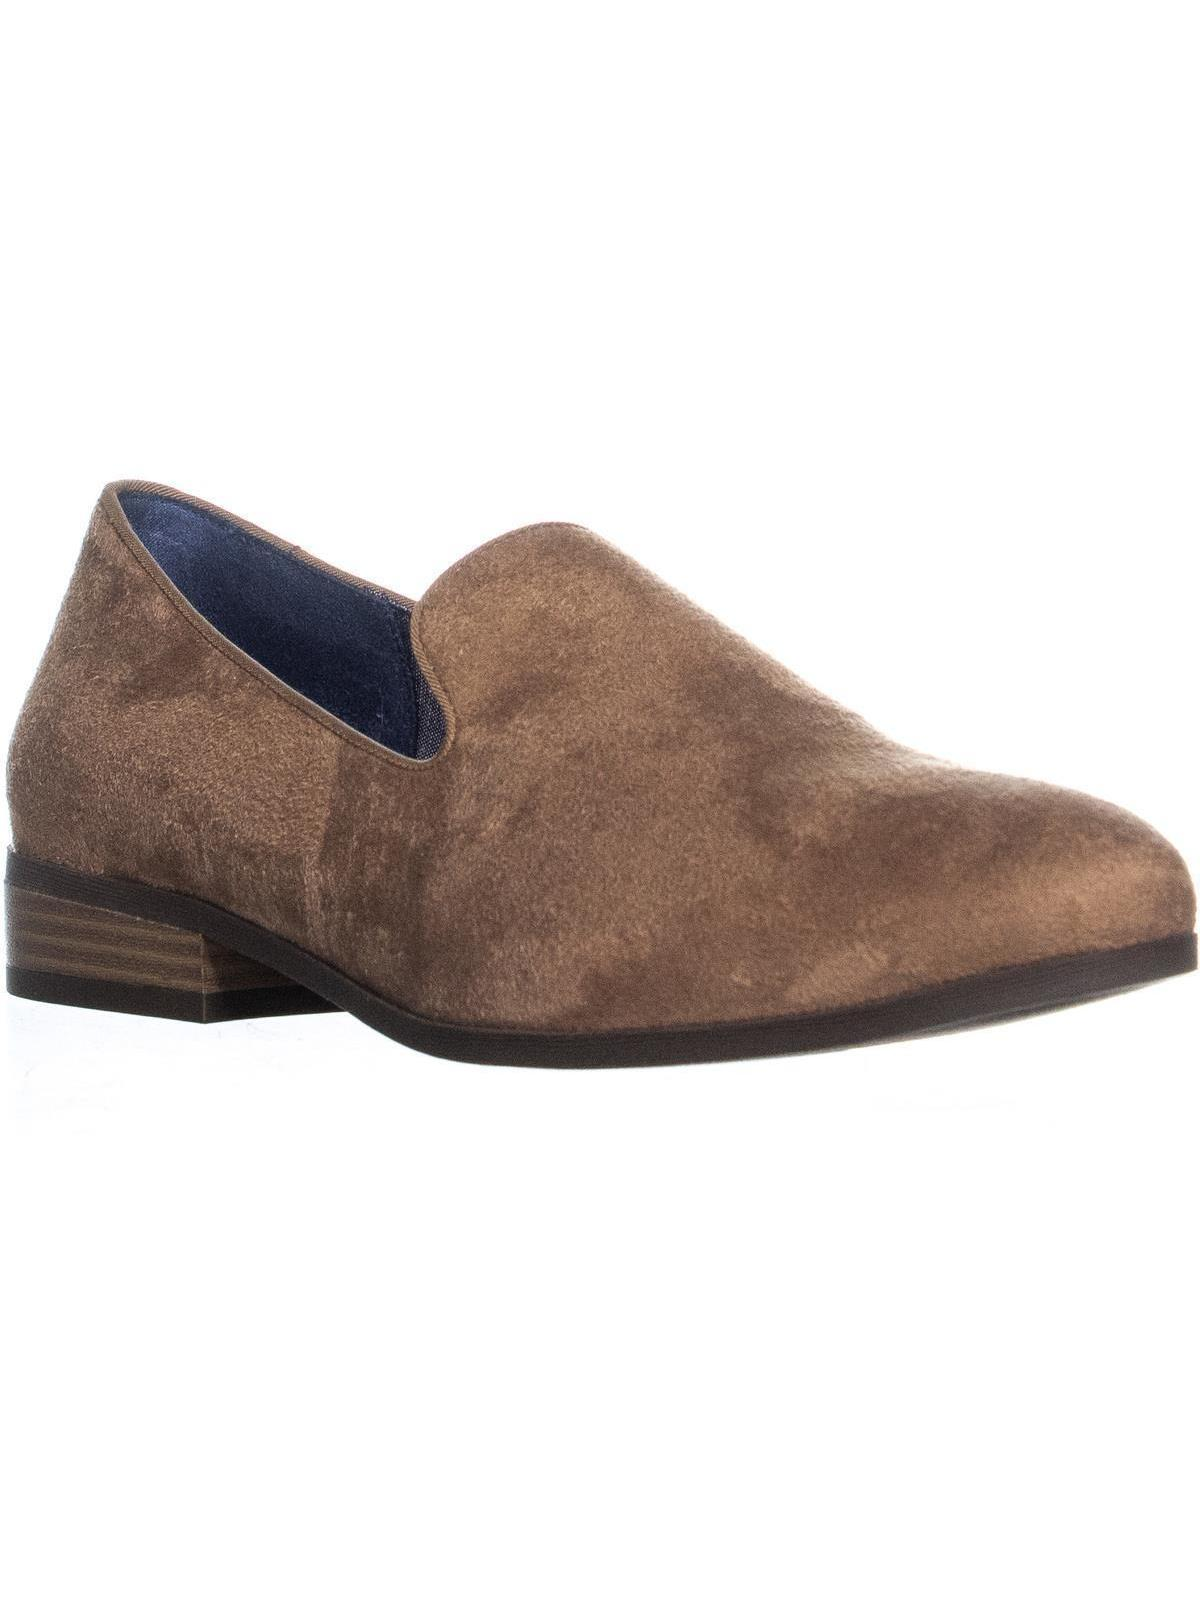 273542e6a68 Dr. Scholl s Emperor Block Heel Loafers